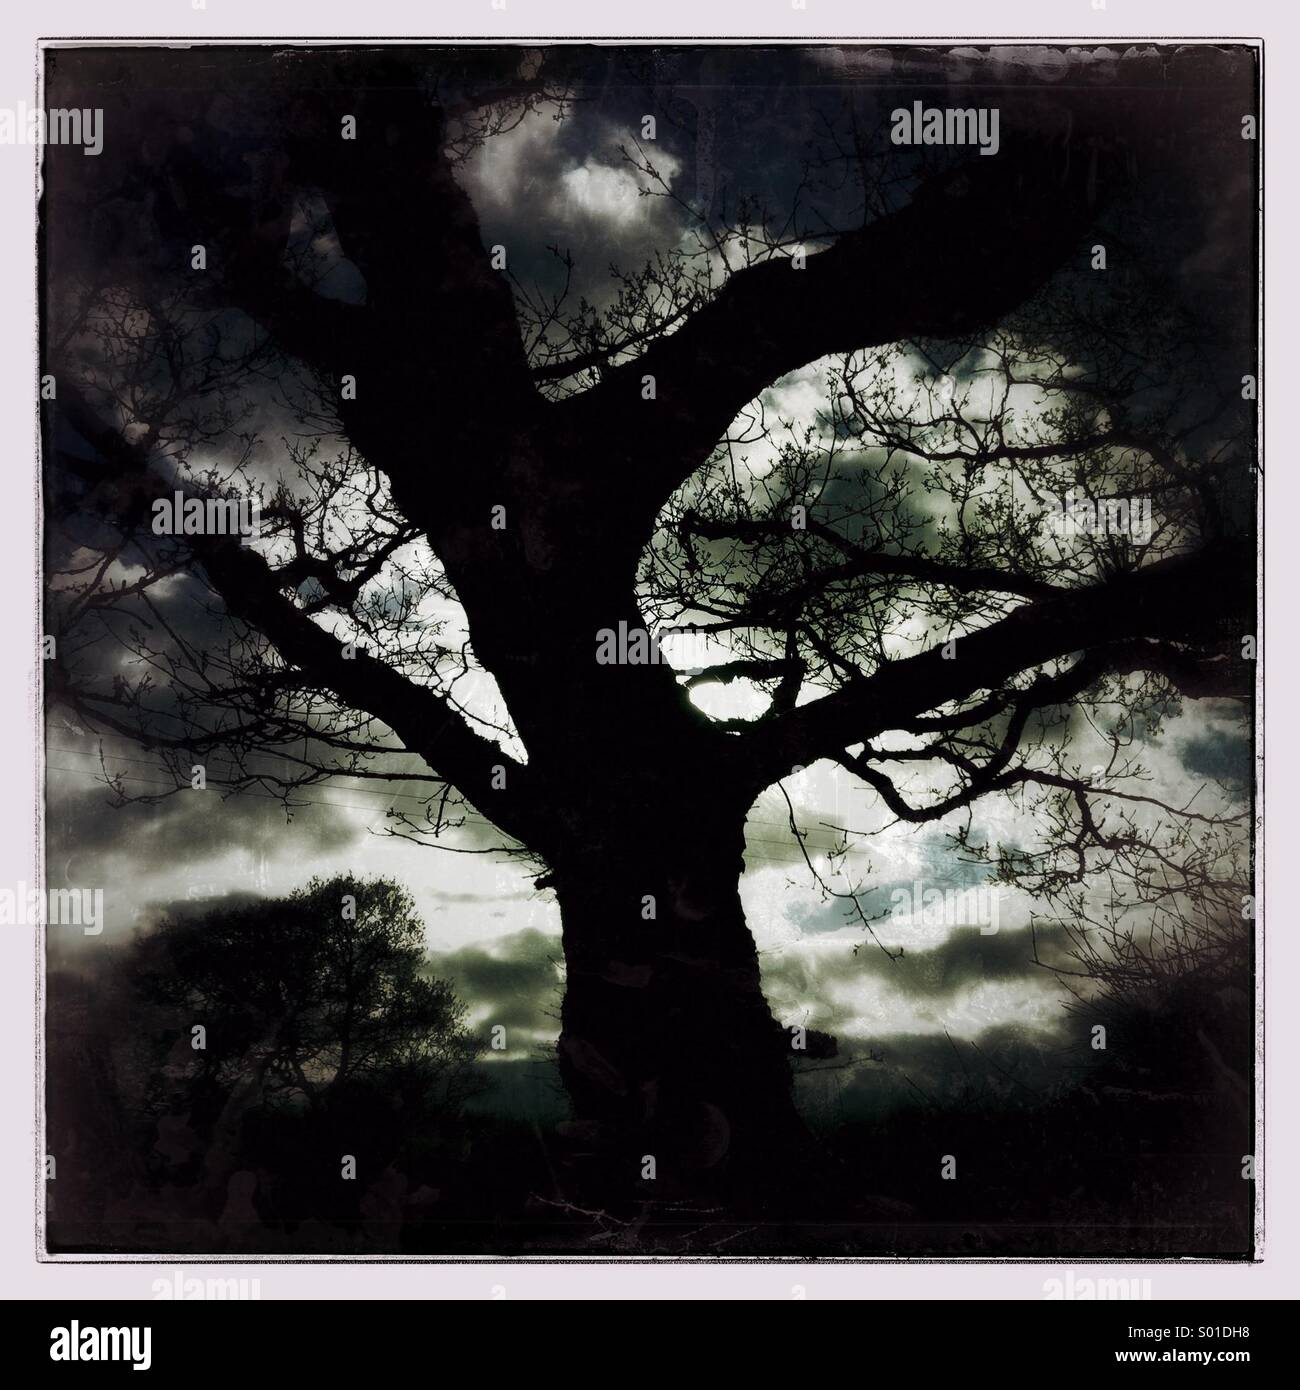 Dark moody tree against a dramatic sky - Stock Image